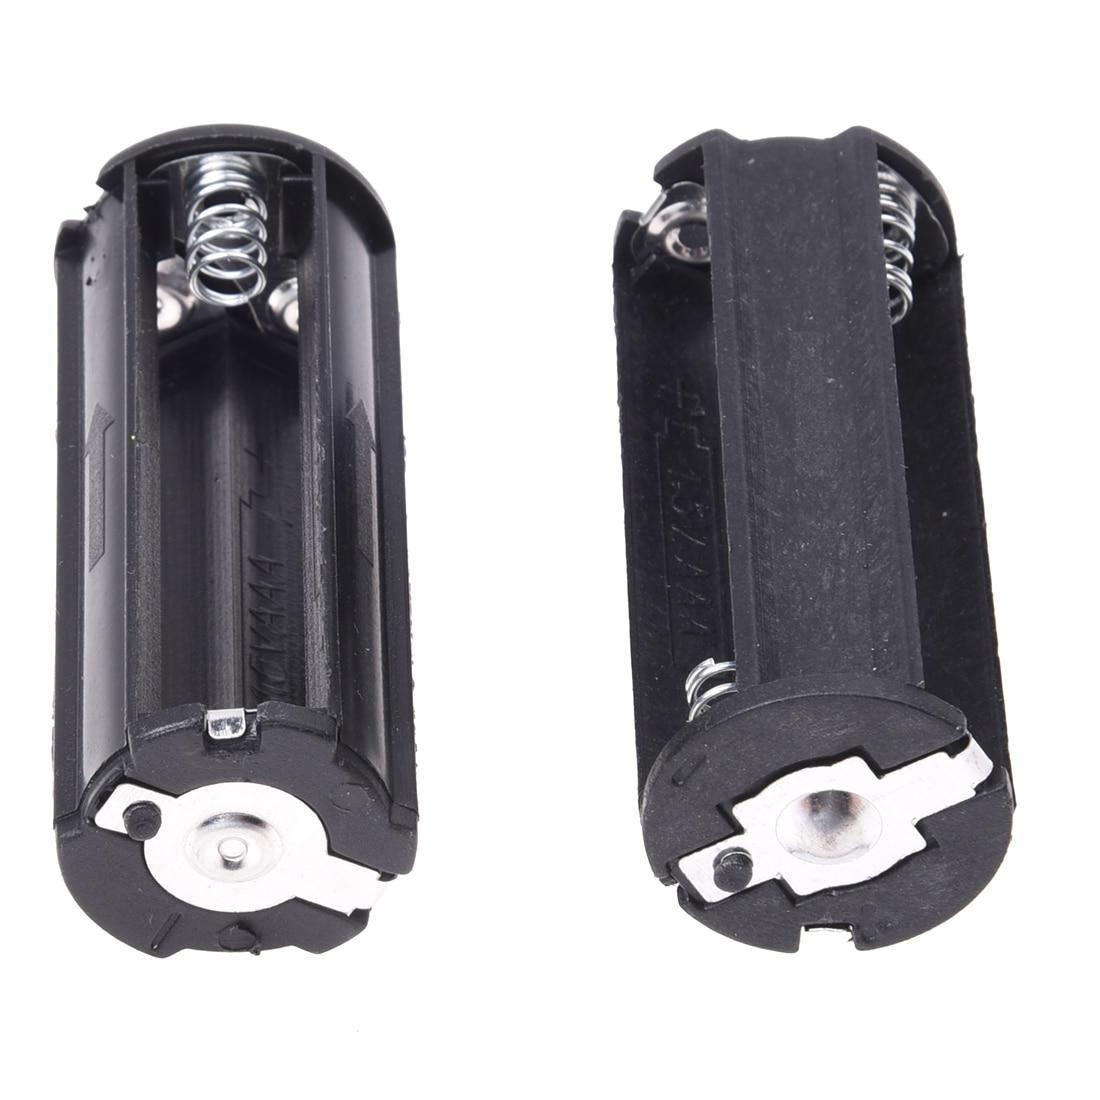 2 шт. черный держатель батареи для 3 х 1,5 В AAA батареи фонарик Фонарь